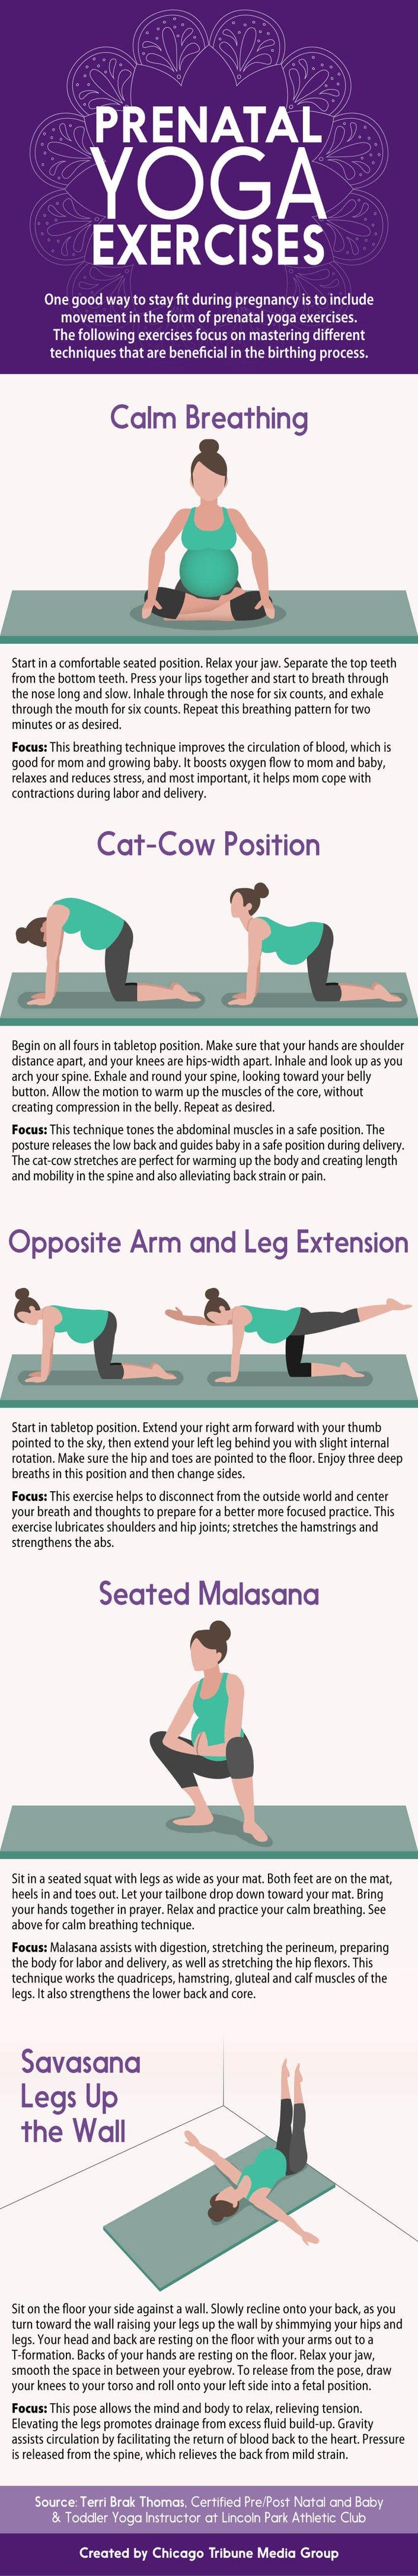 Prenatal Yoga Infographic.jpg